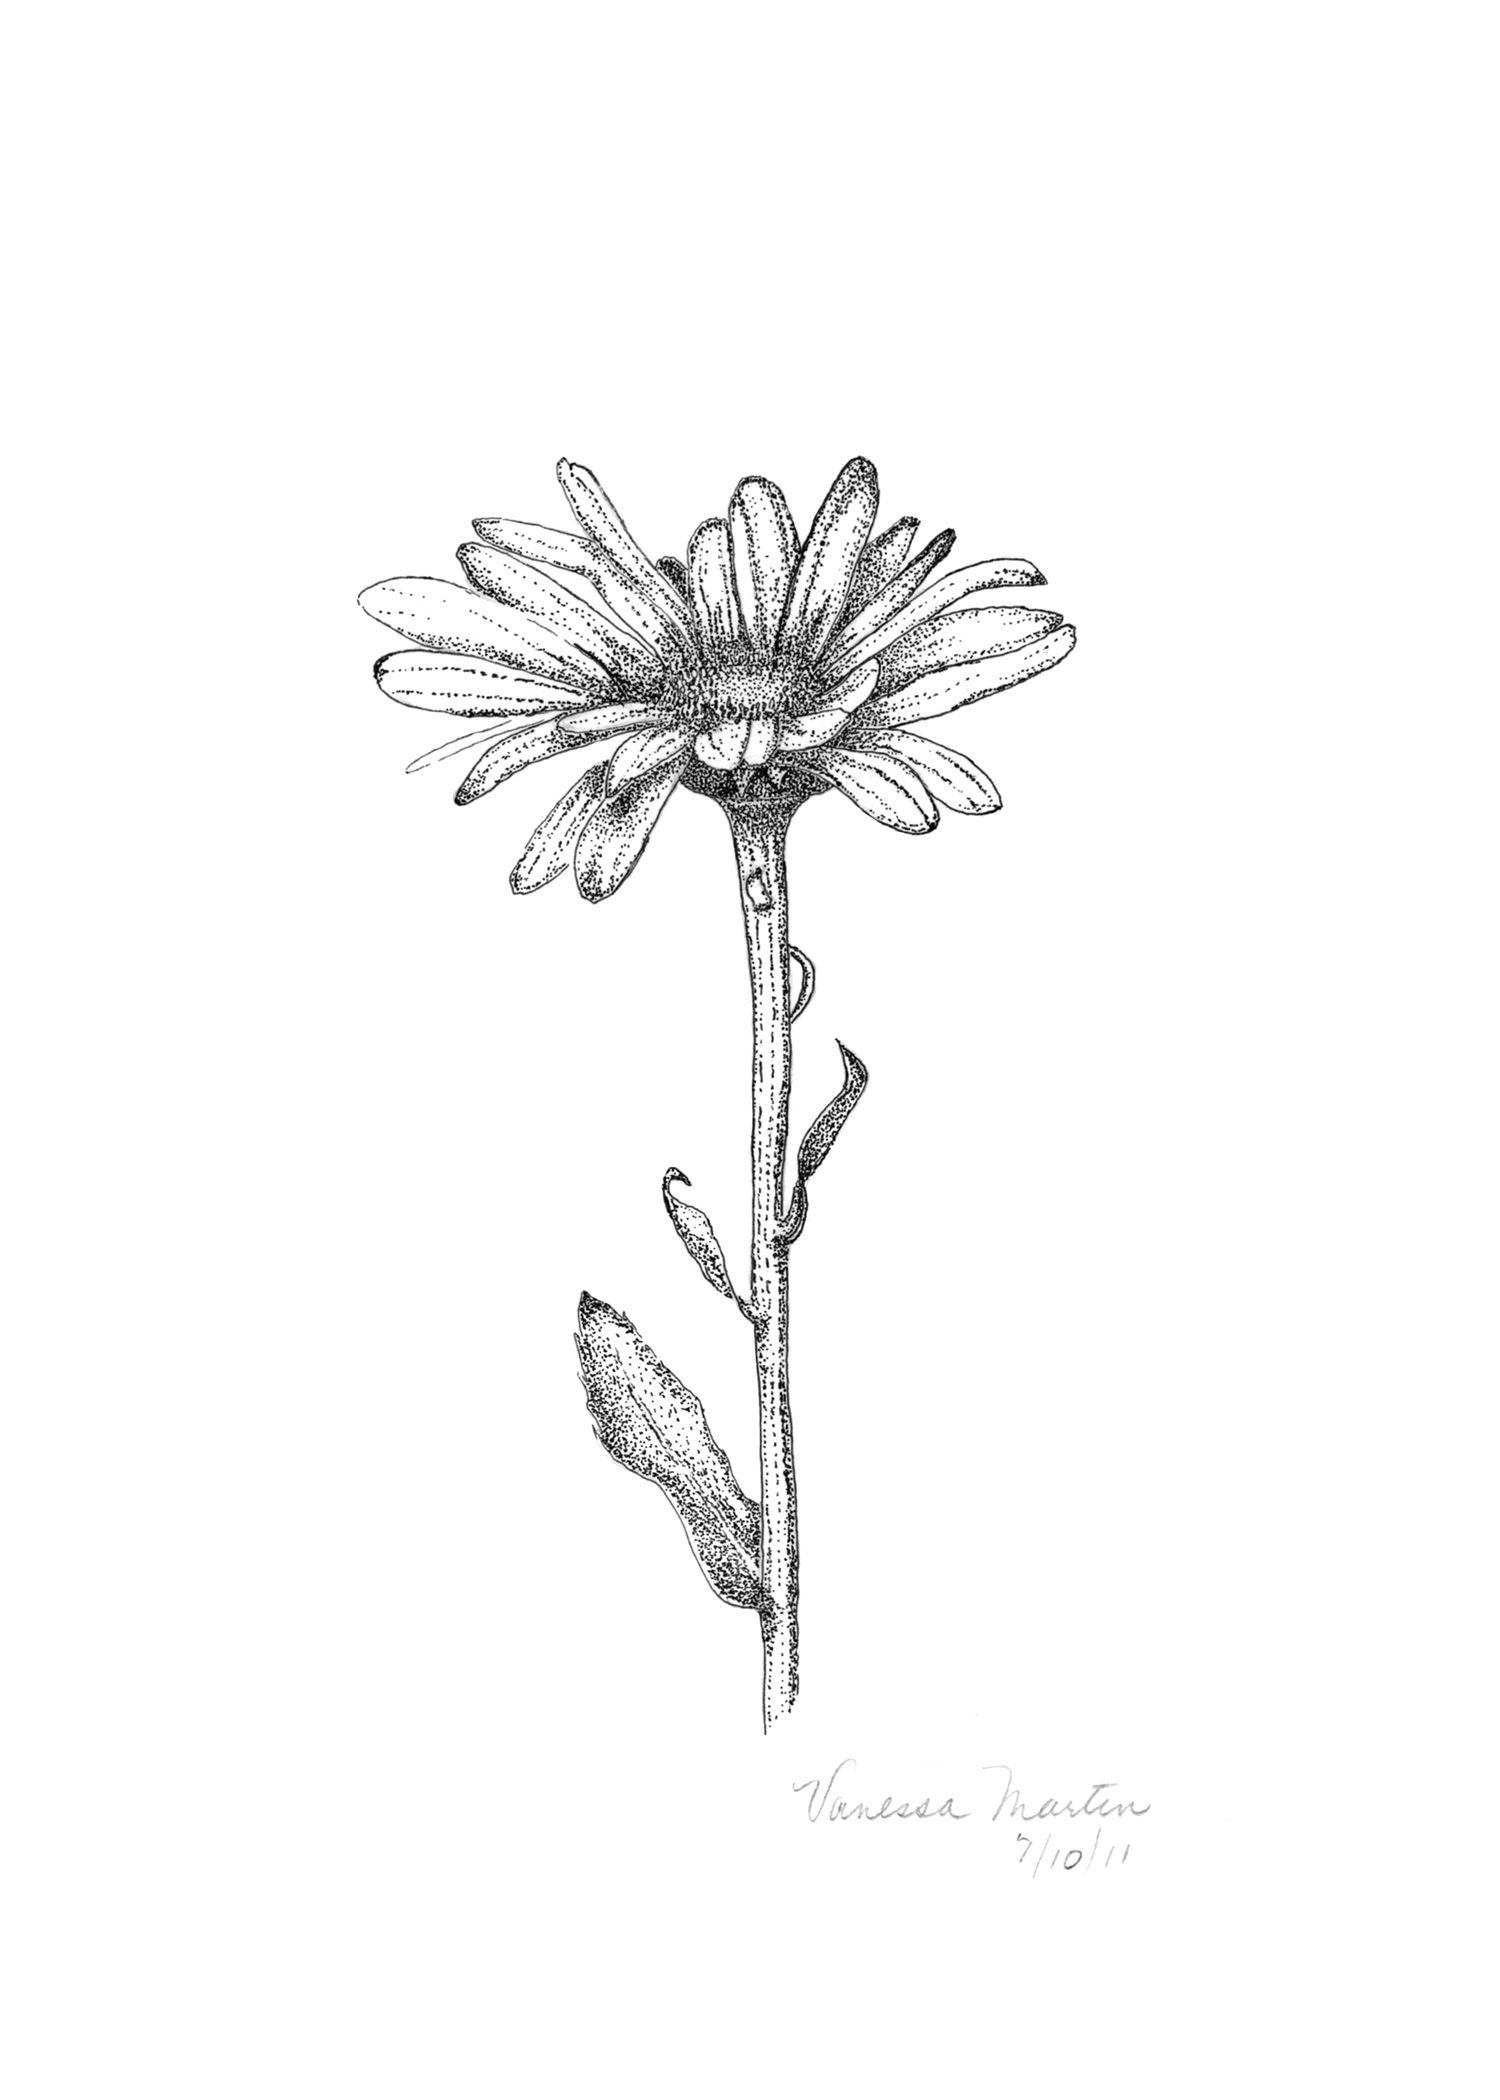 Shasta Daisy Art and Illustration Pinterest